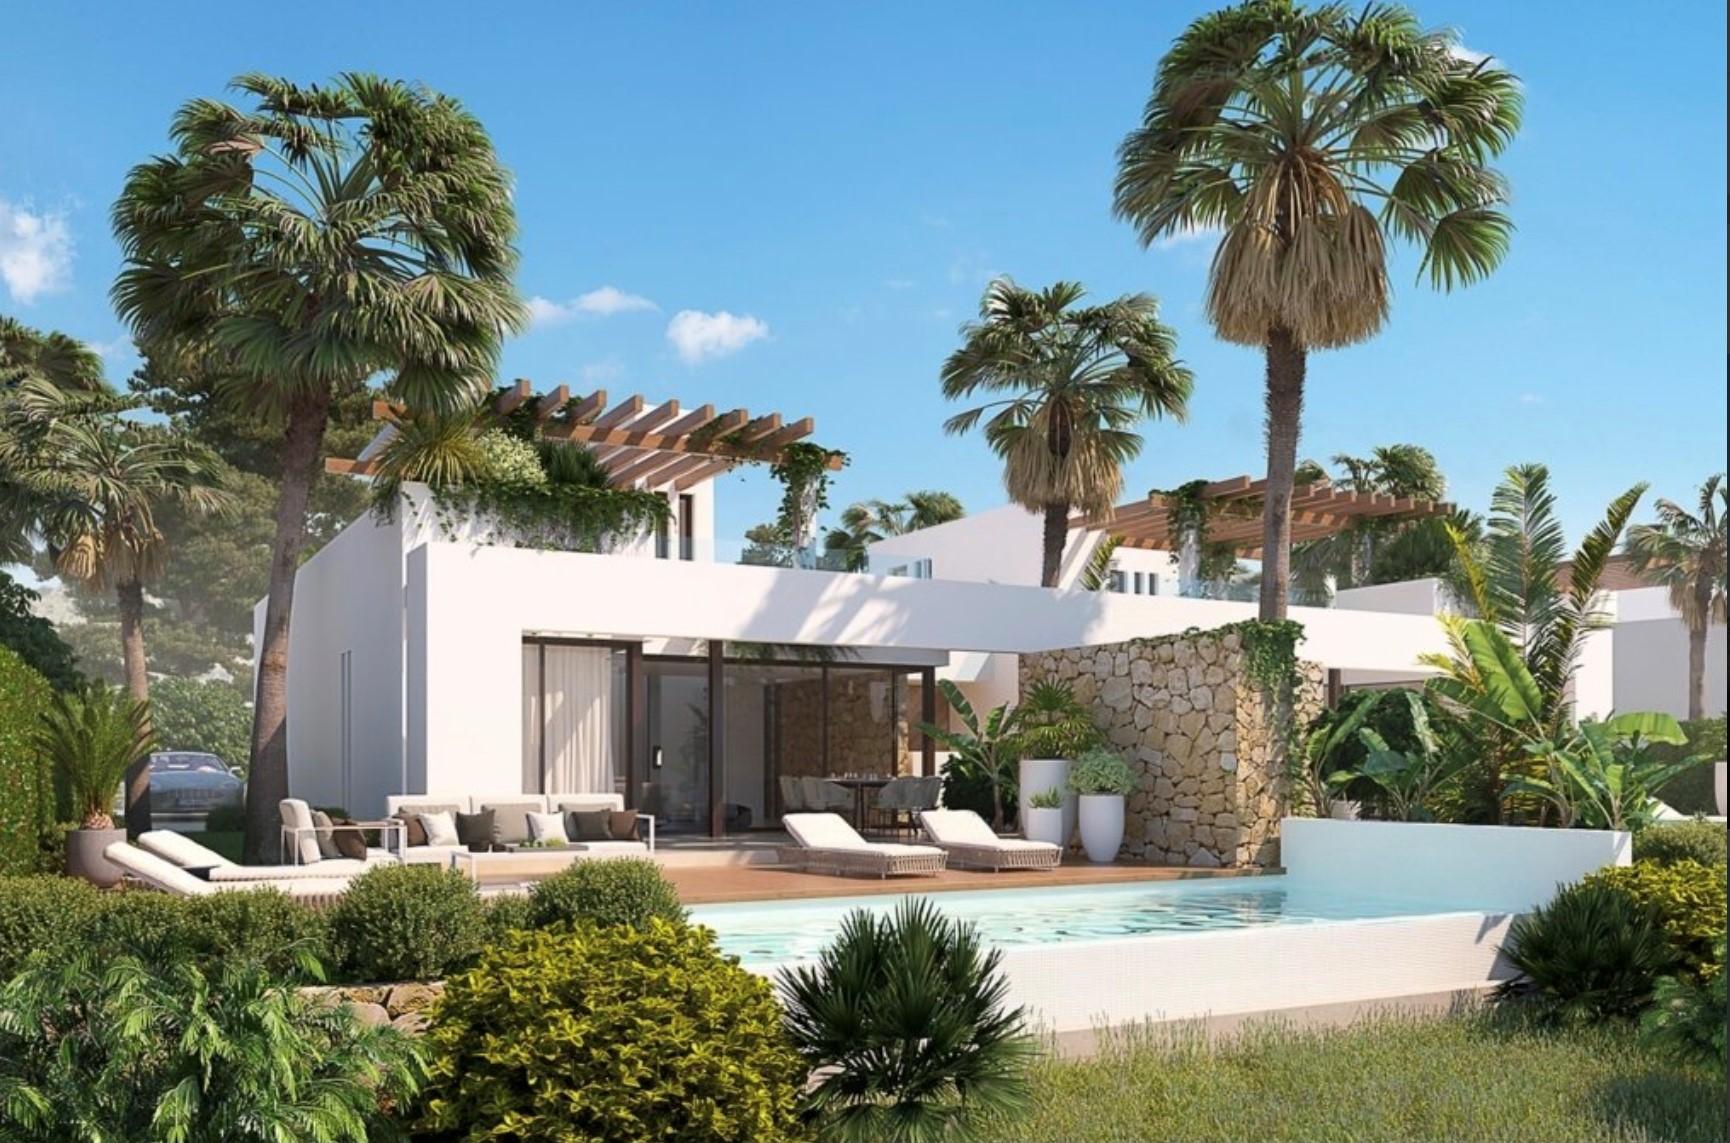 Alicante villa €423.800